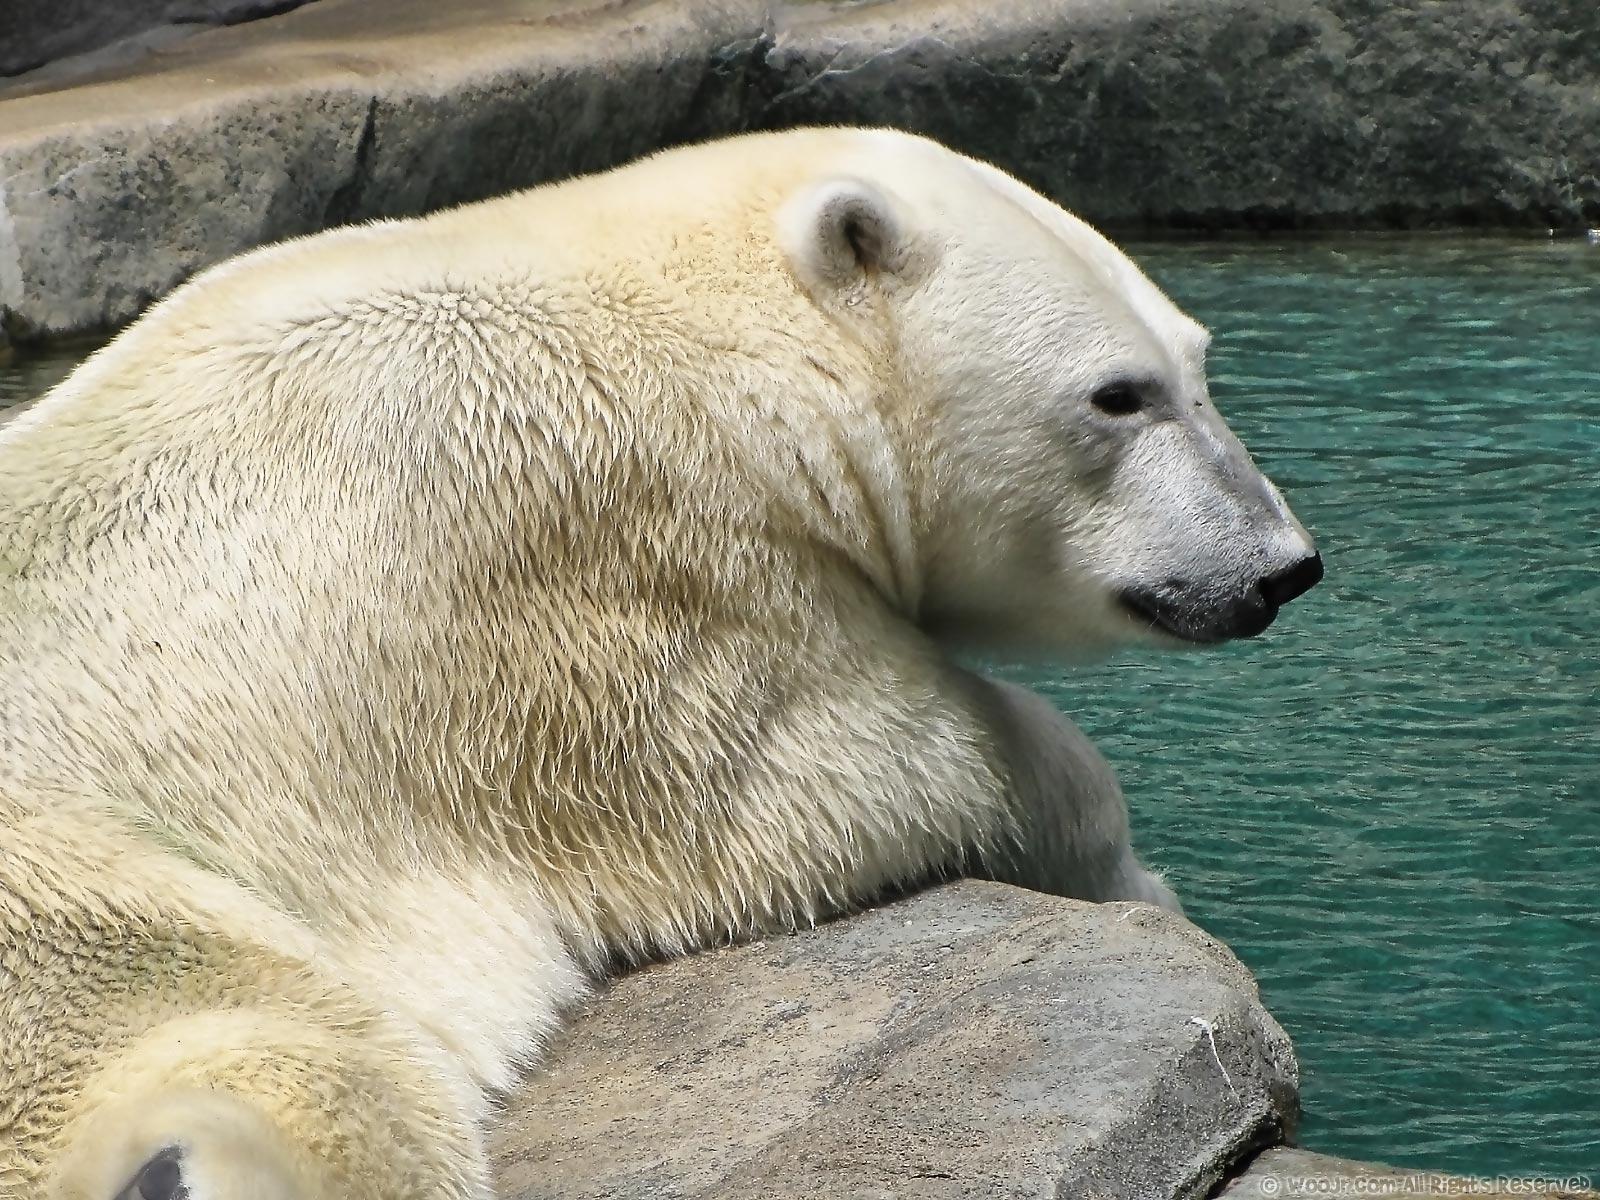 polar bear wallpaper 1600 x 1200 polar bear wallpaper 1280 1600x1200